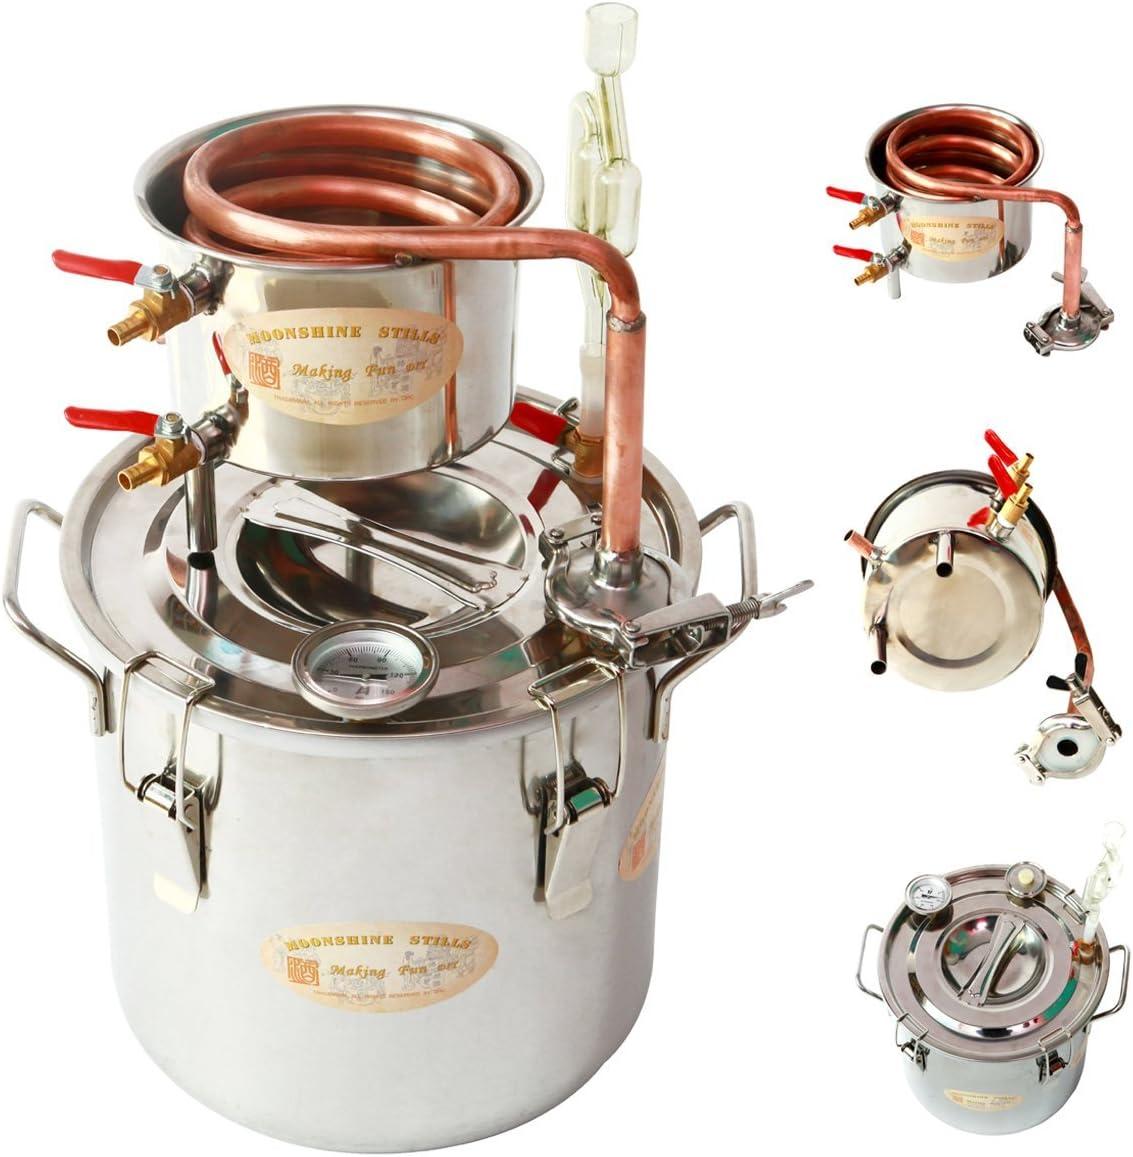 newwishjc 30 L 新しいホーム蒸留器 净水器/芳香蒸留水 ホーム醸造キット の銅ットルムーンシャインそれでもブリューキットスピリッツボイラースピリッツアルコール水の精油/エッセンシャルオイル